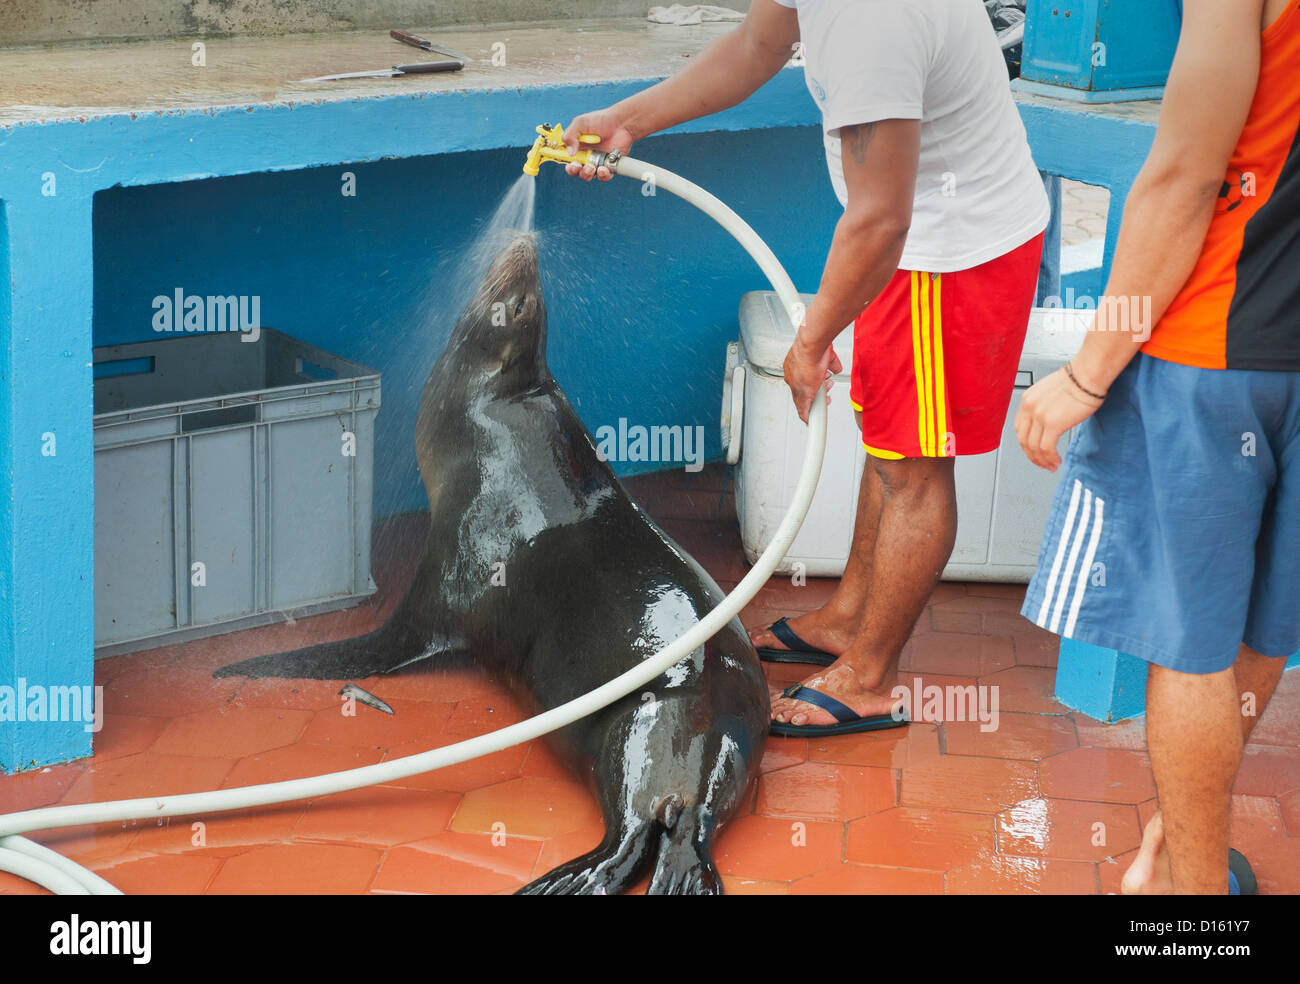 Galapagos Sea Lion (Zalophus wollebaeki) gets a shower  at Fish Market, Puerto Ayora,   Galapagos Islands, Ecuador - Stock Image